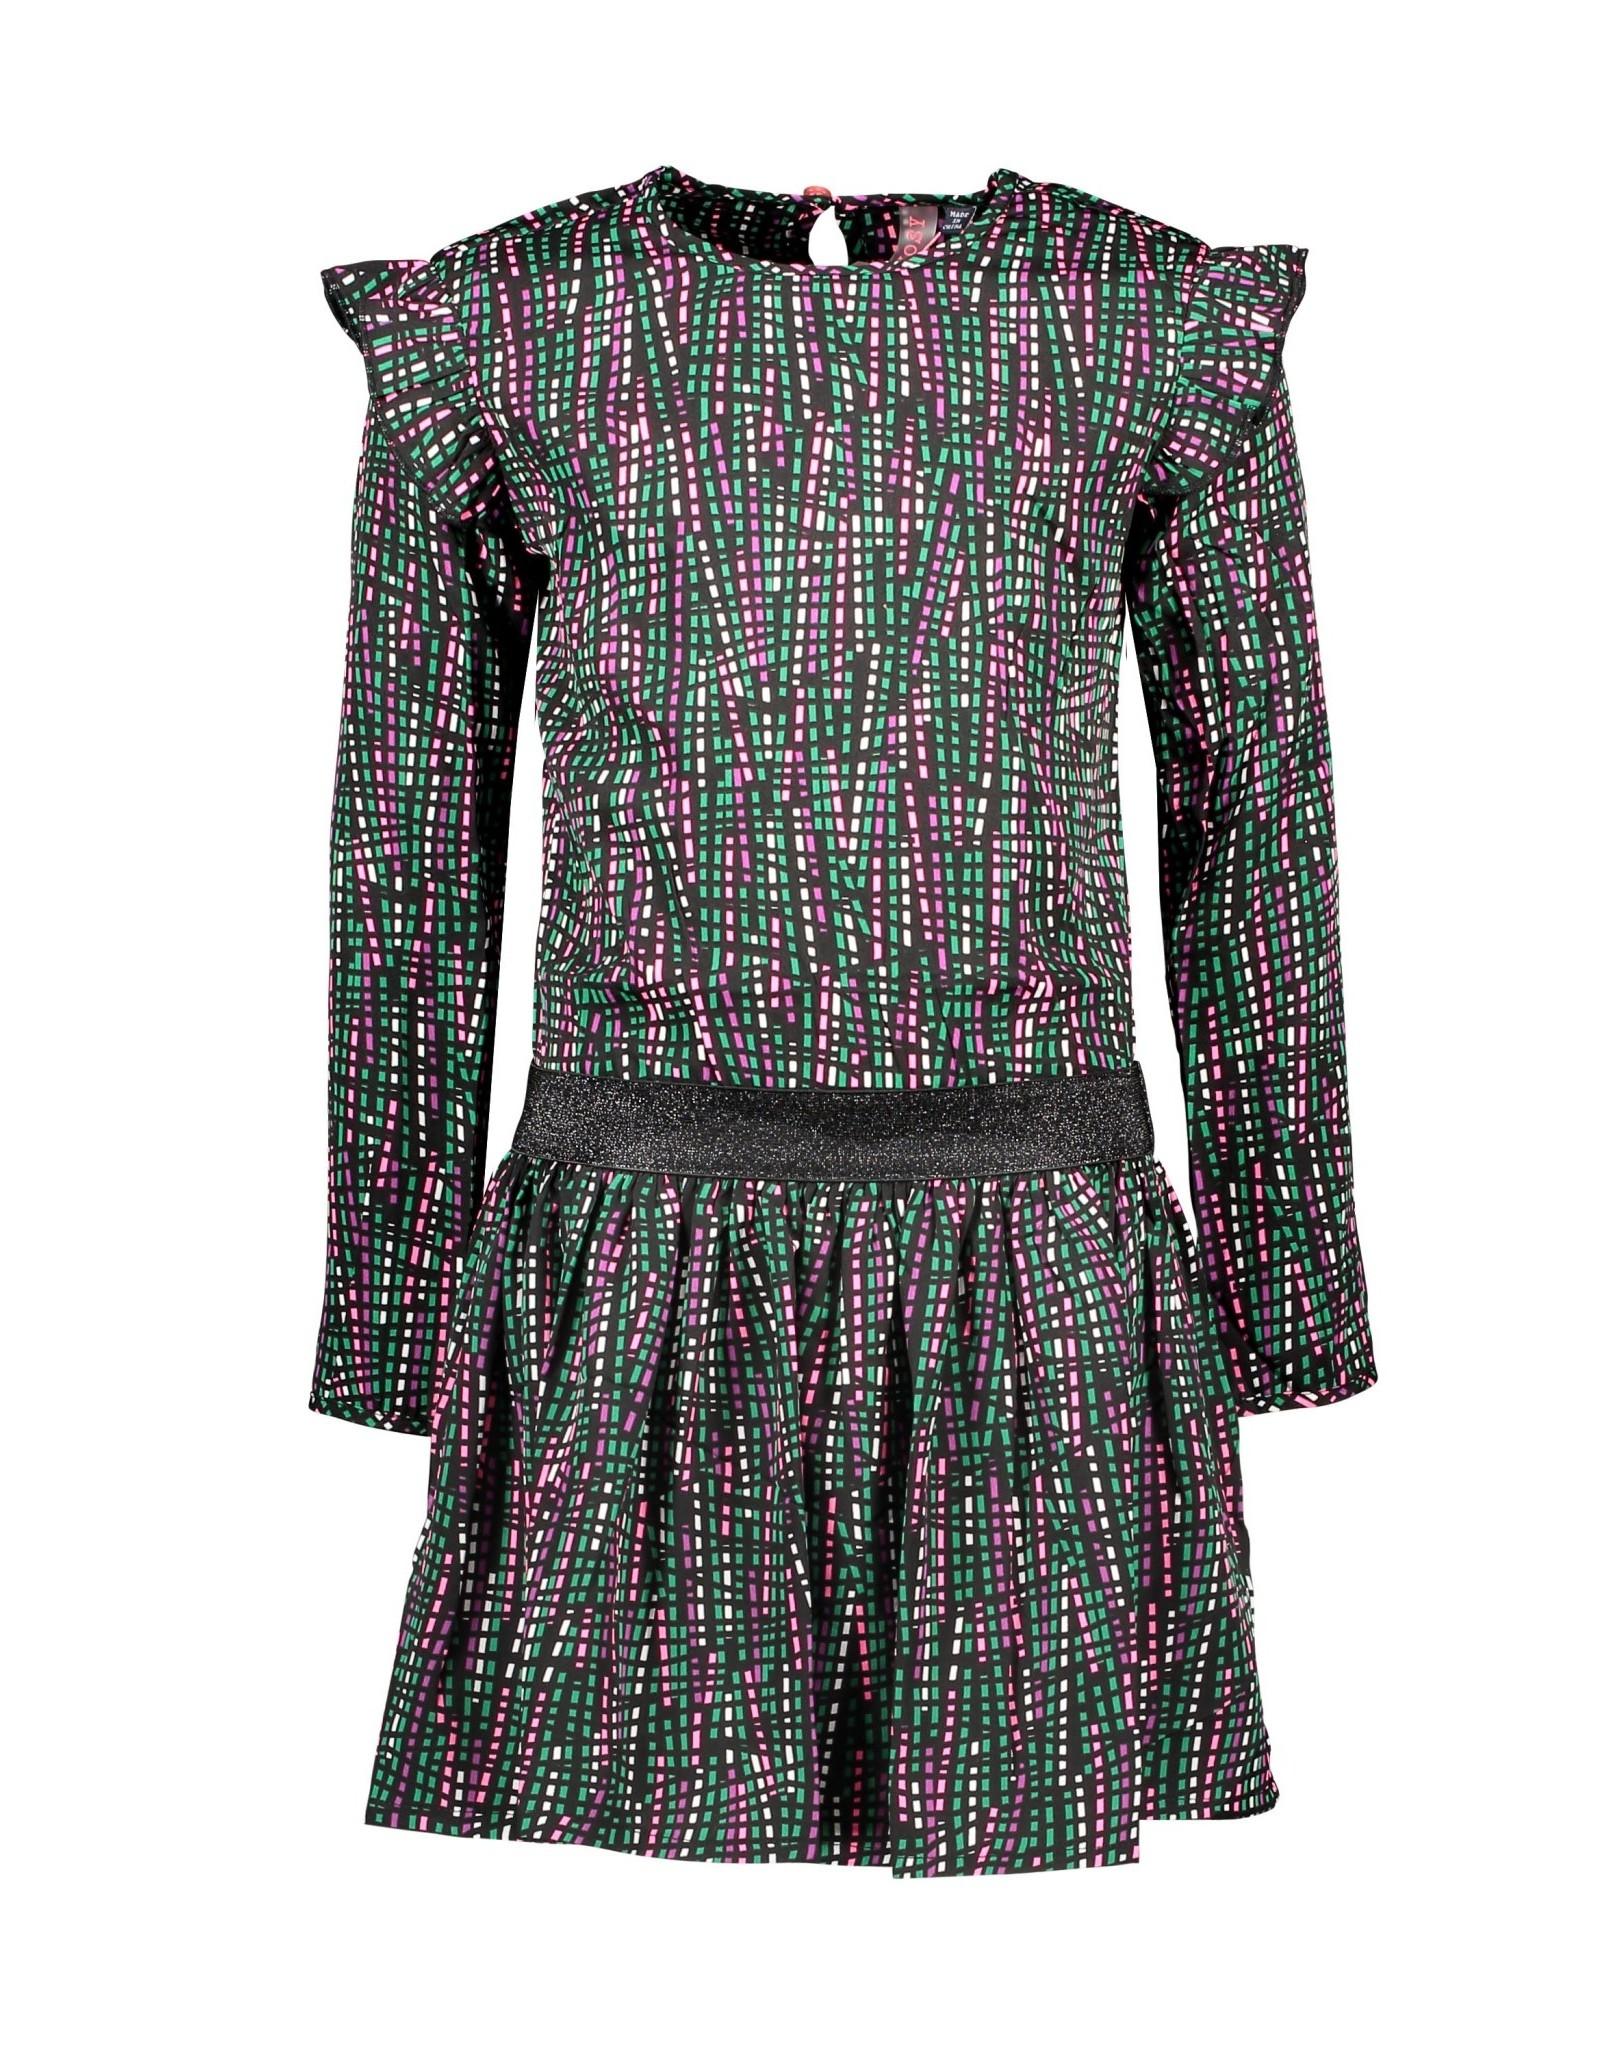 B-Nosy jurk met ruffles detail